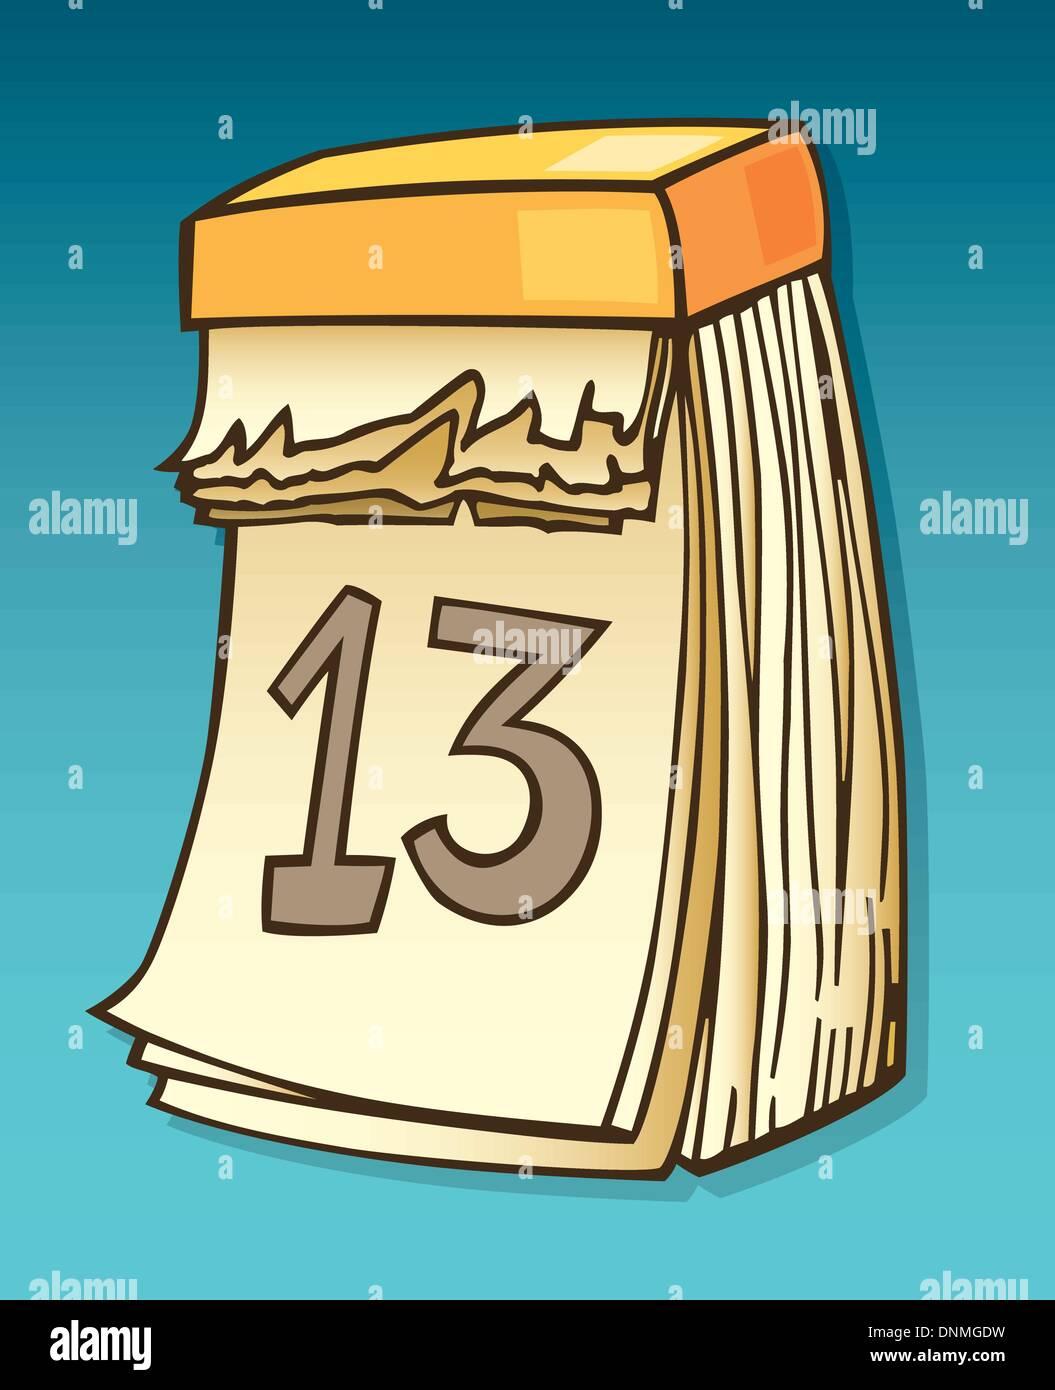 Illustration of thirteenth on wall calendar Stock Vector Art ...